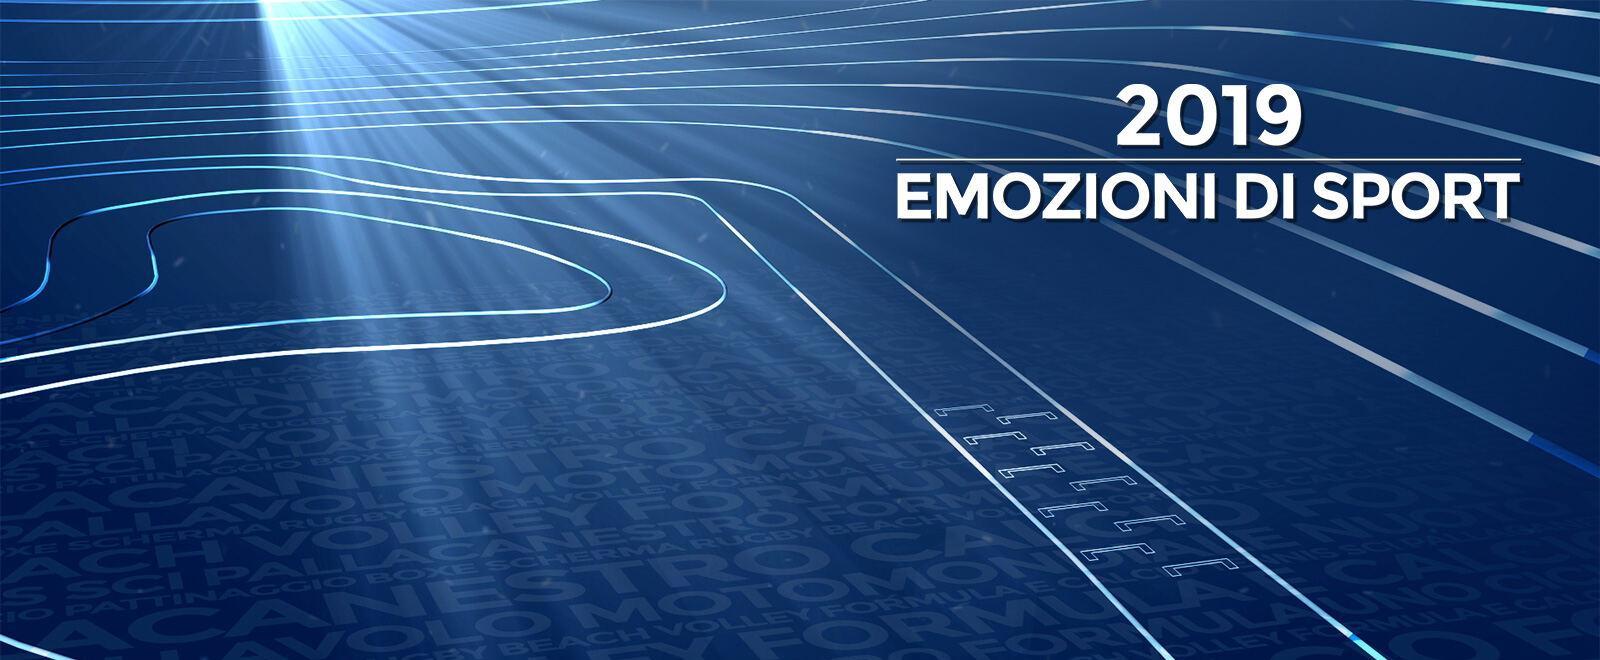 2019 - emozioni sport